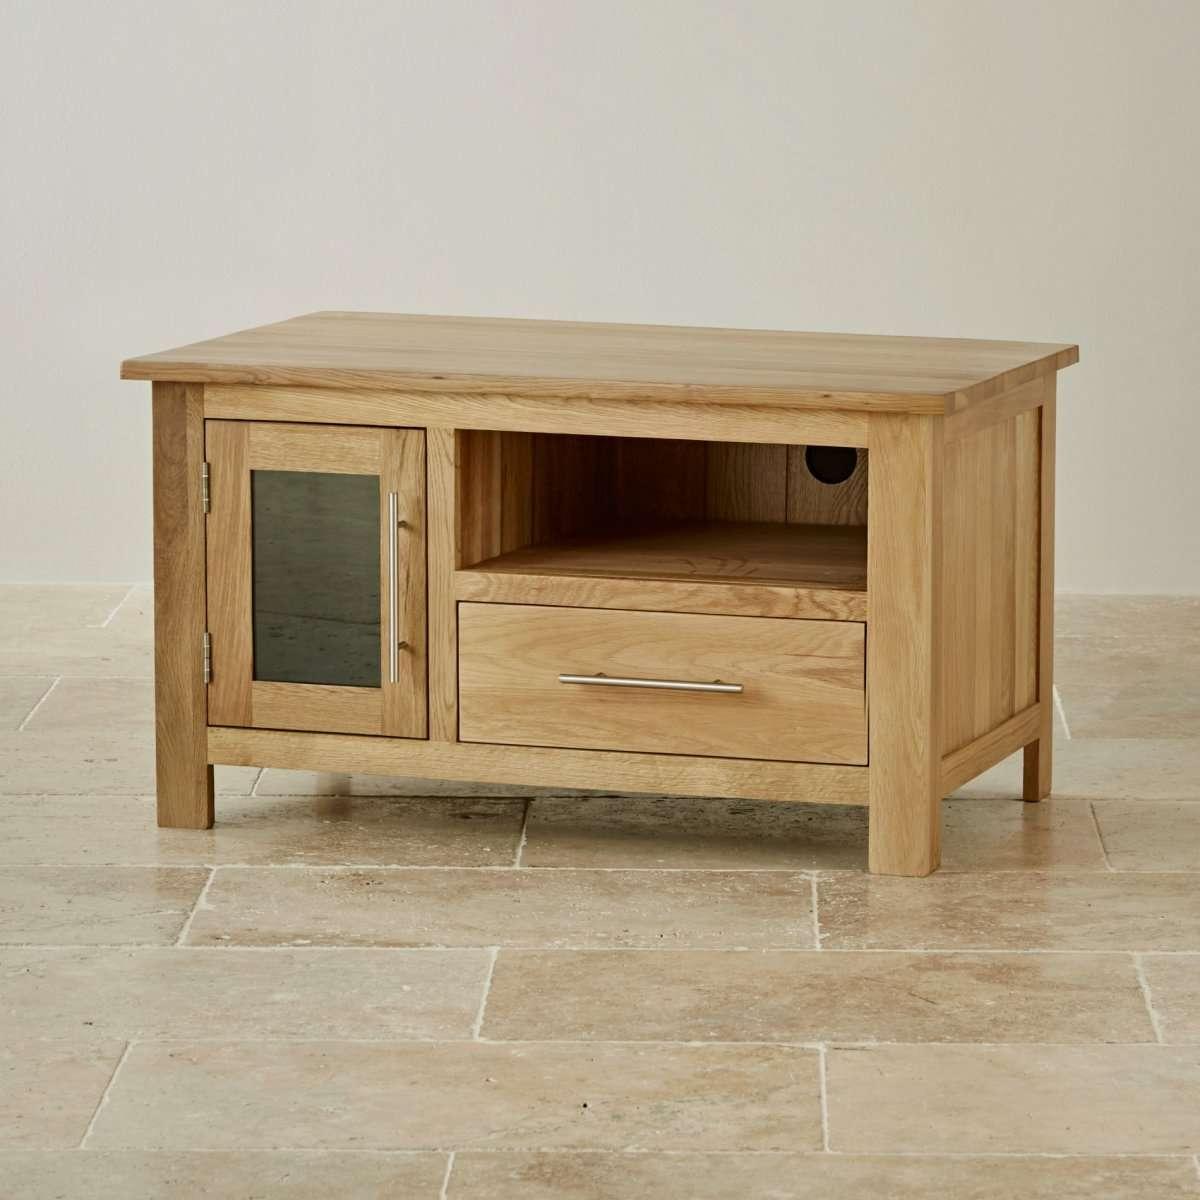 Rivermead Natural Solid Oak Tv + Dvd Cabinet | Lounge Furniture Regarding Small Oak Tv Cabinets (View 6 of 20)